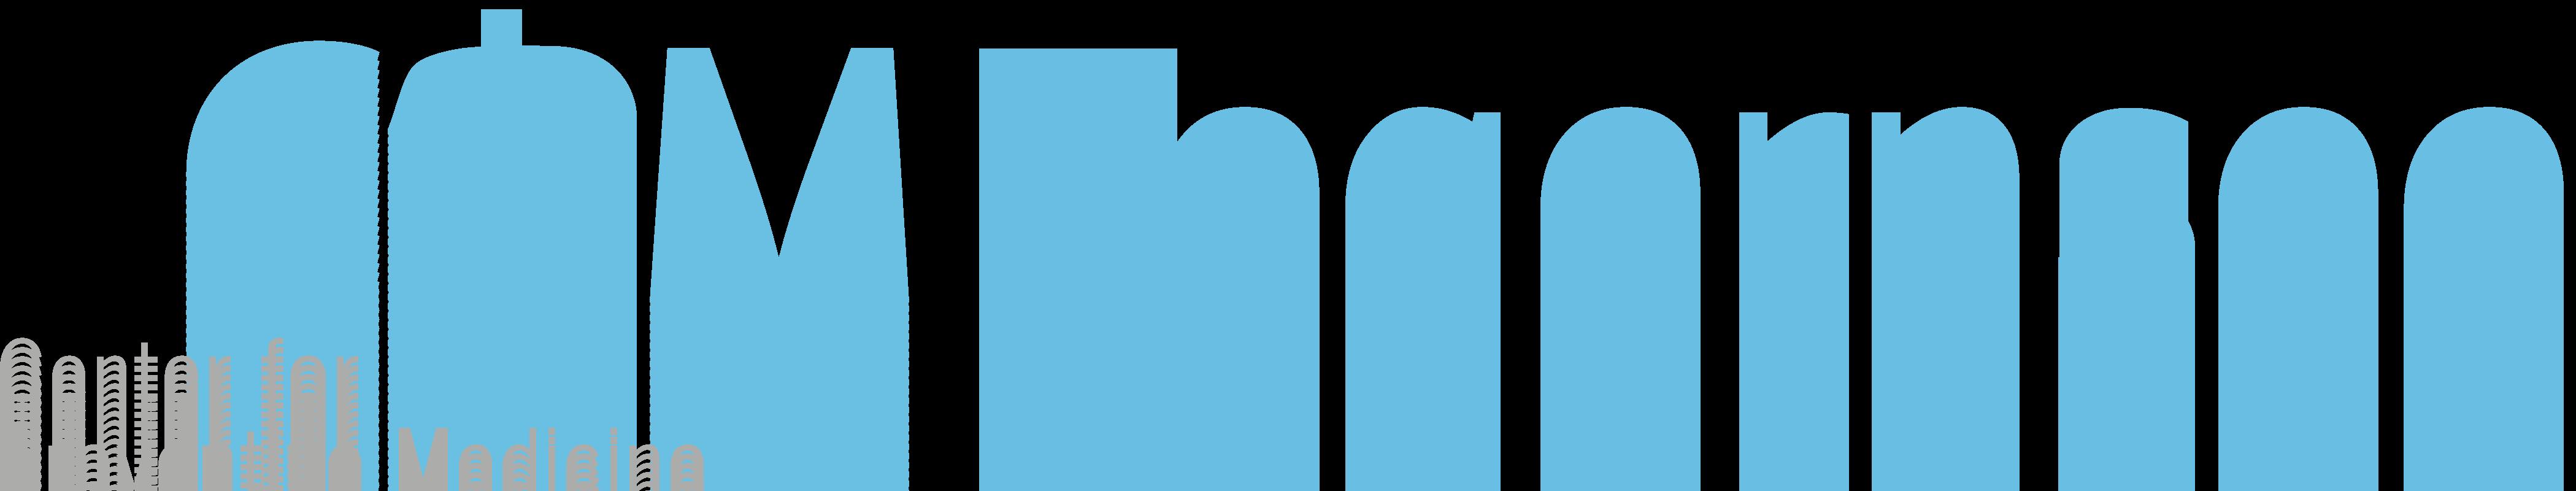 //dr-beckenbauer.de/wp-content/uploads/2017/11/CPM-TEG_4C.png